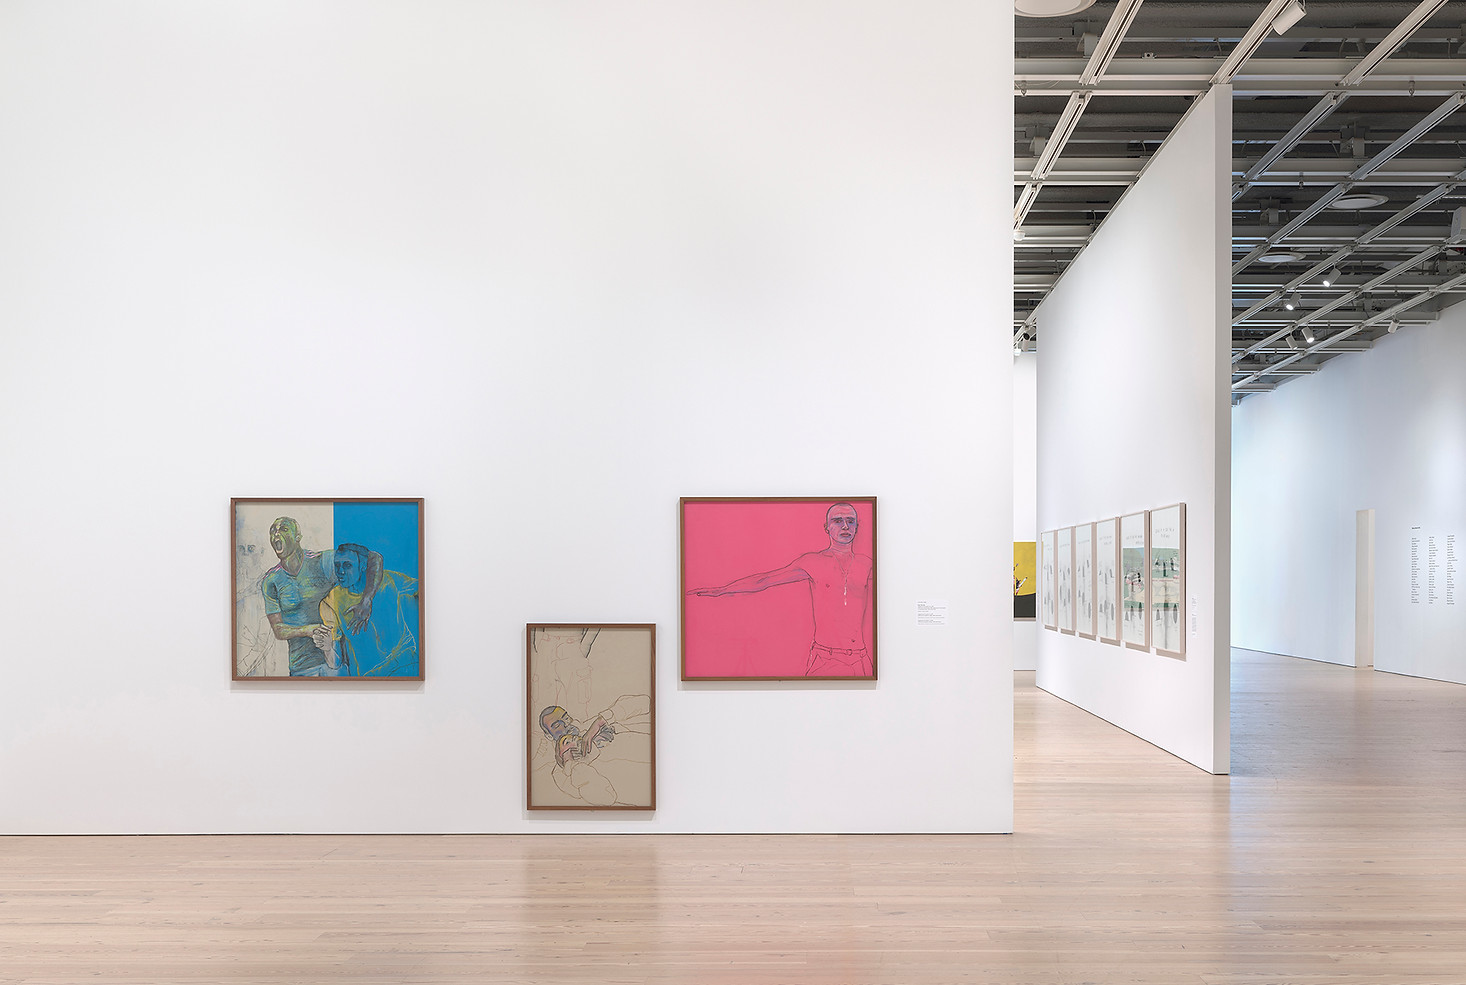 Installation view of 2019 Whitney Biennial, Whitney Museum of American Art, New York. Photo©Joerg Lohse